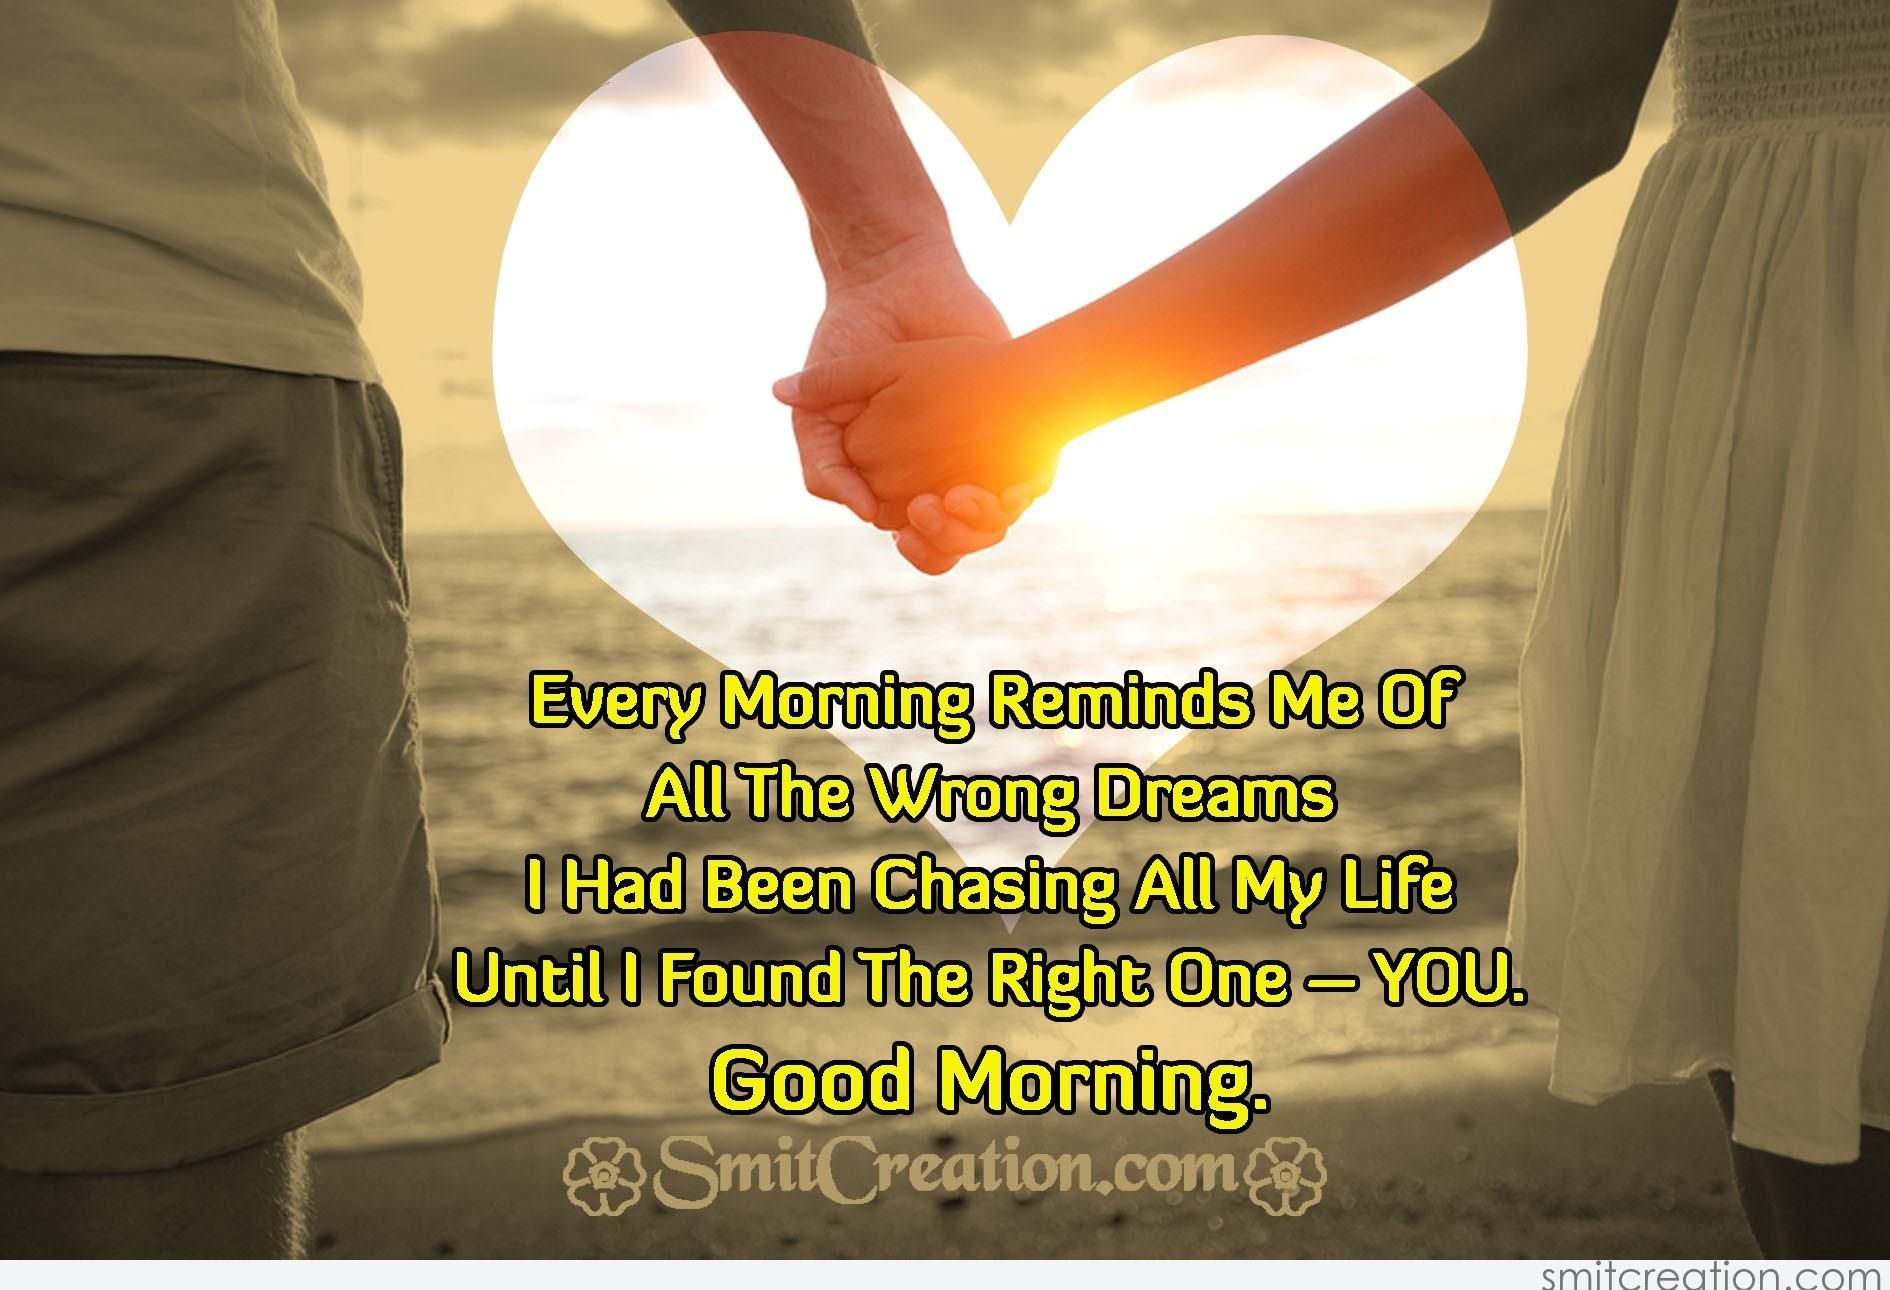 Kubek Good Morning Love Of My Life : Good morning smitcreation